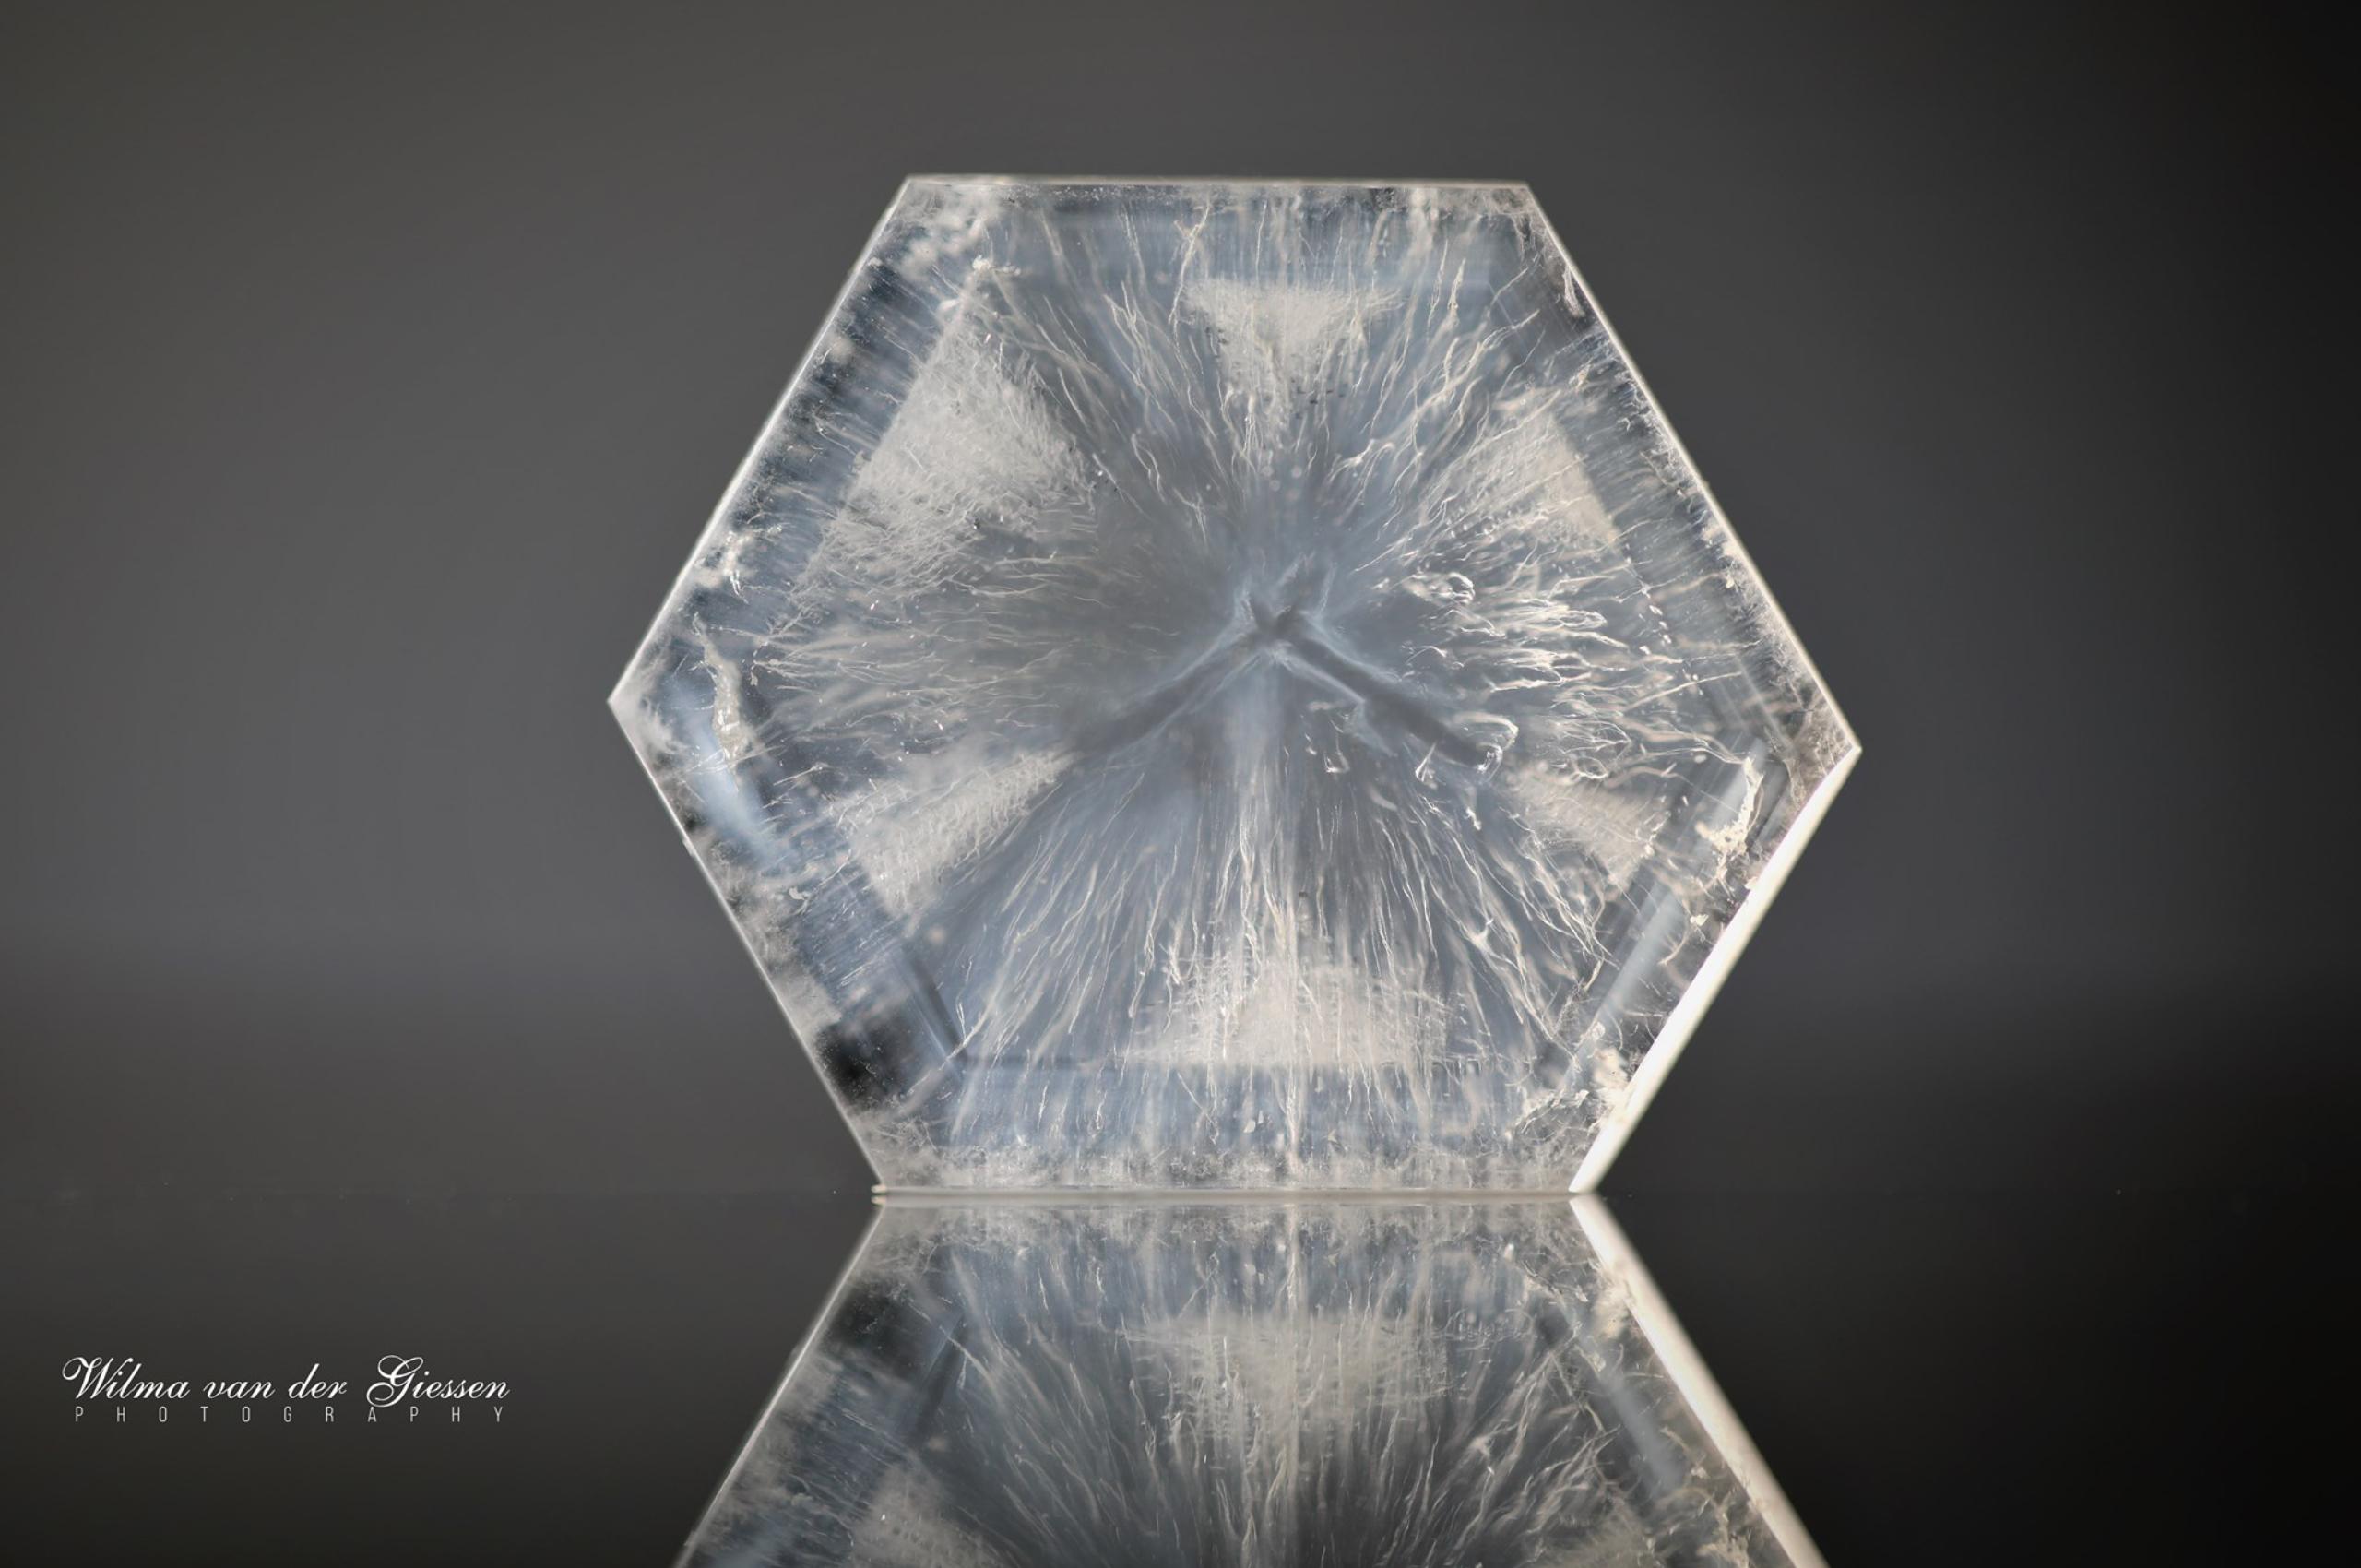 Trapiche like quartz from Colombia. Photo by Wilma van der Giessen